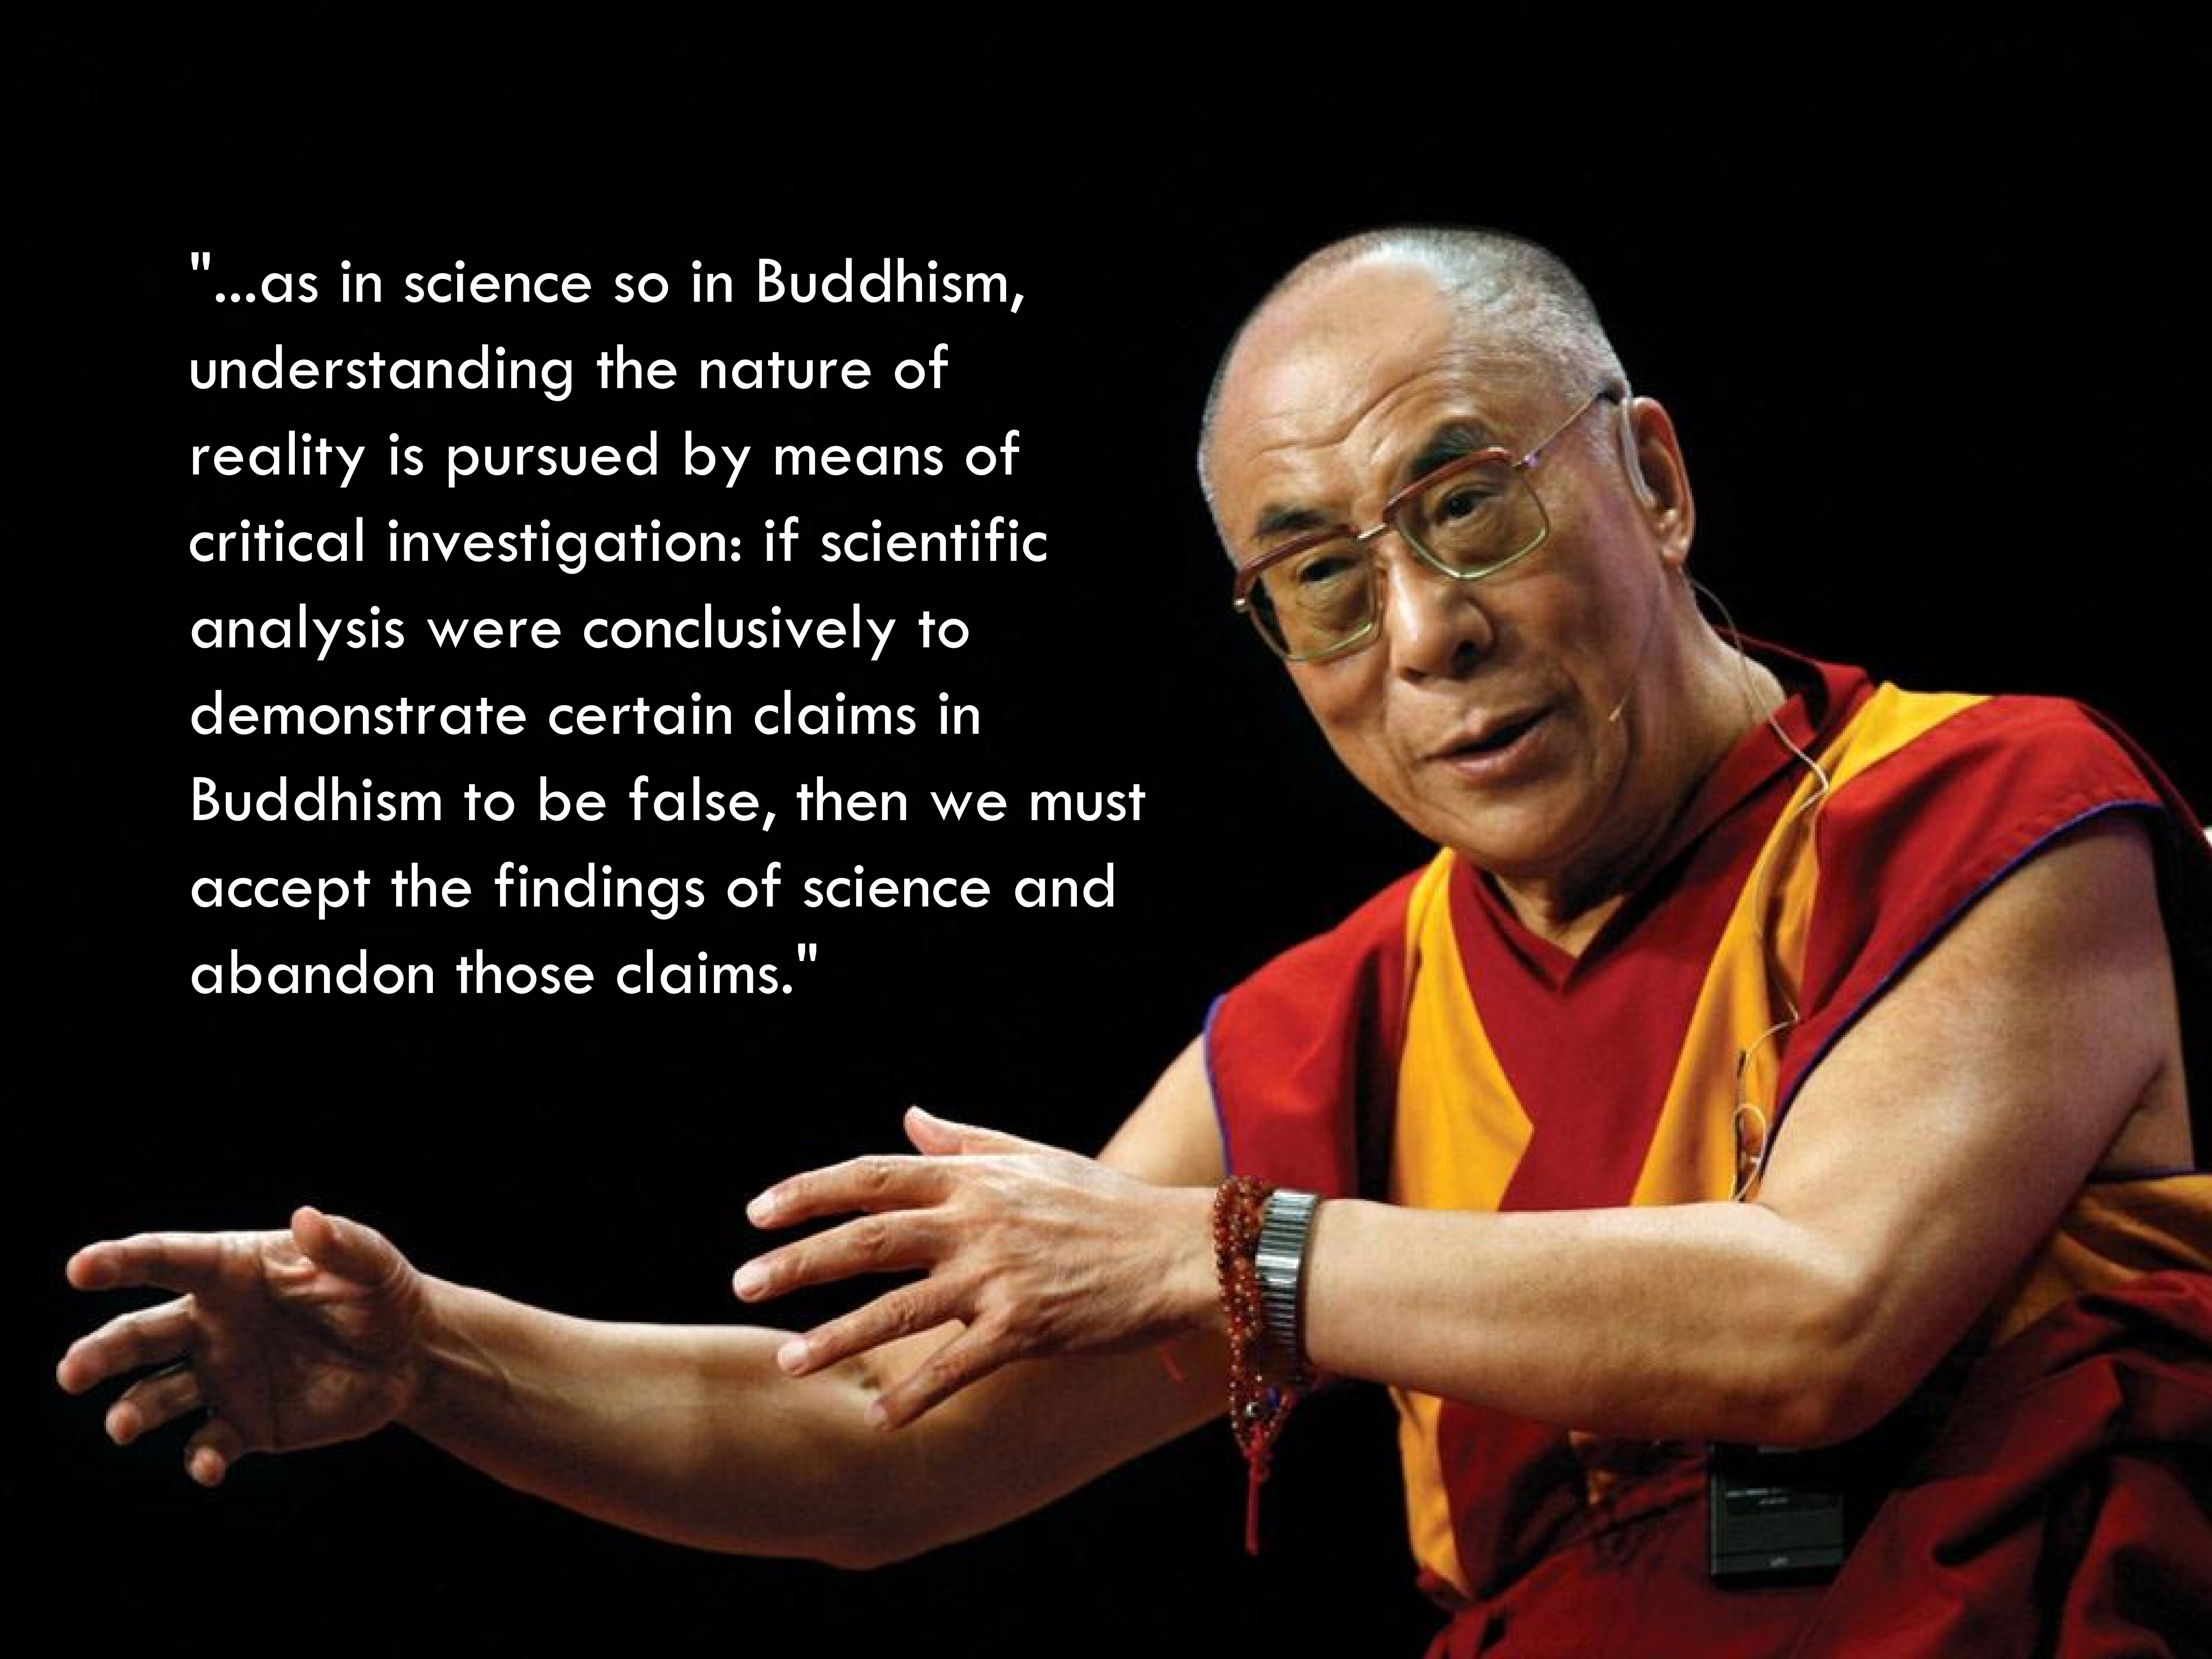 dalai lama quotes 19